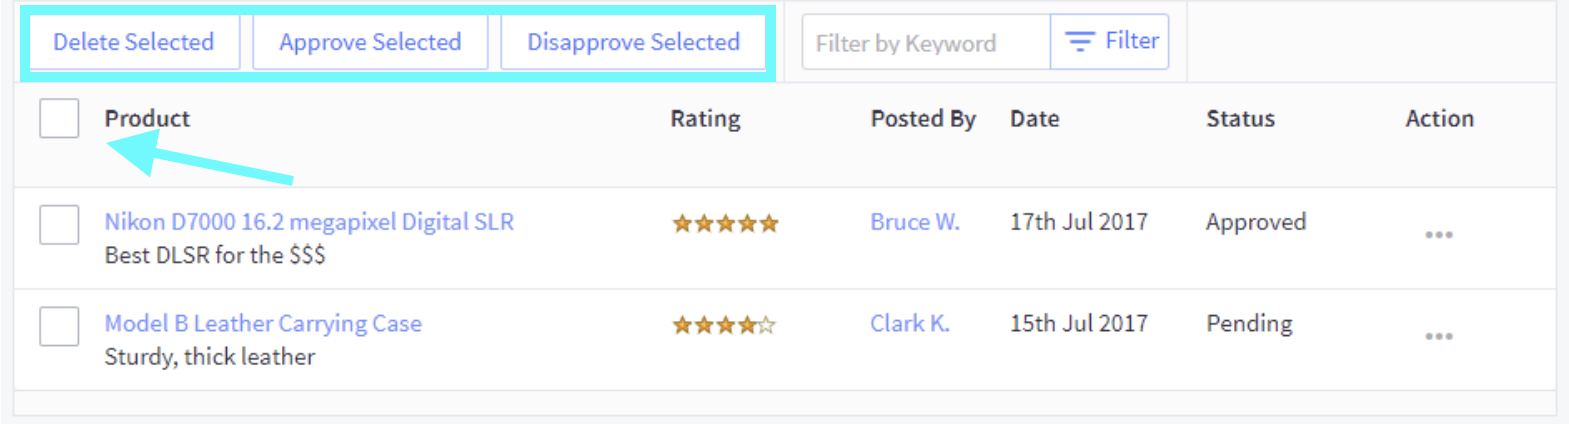 Authorize reviews